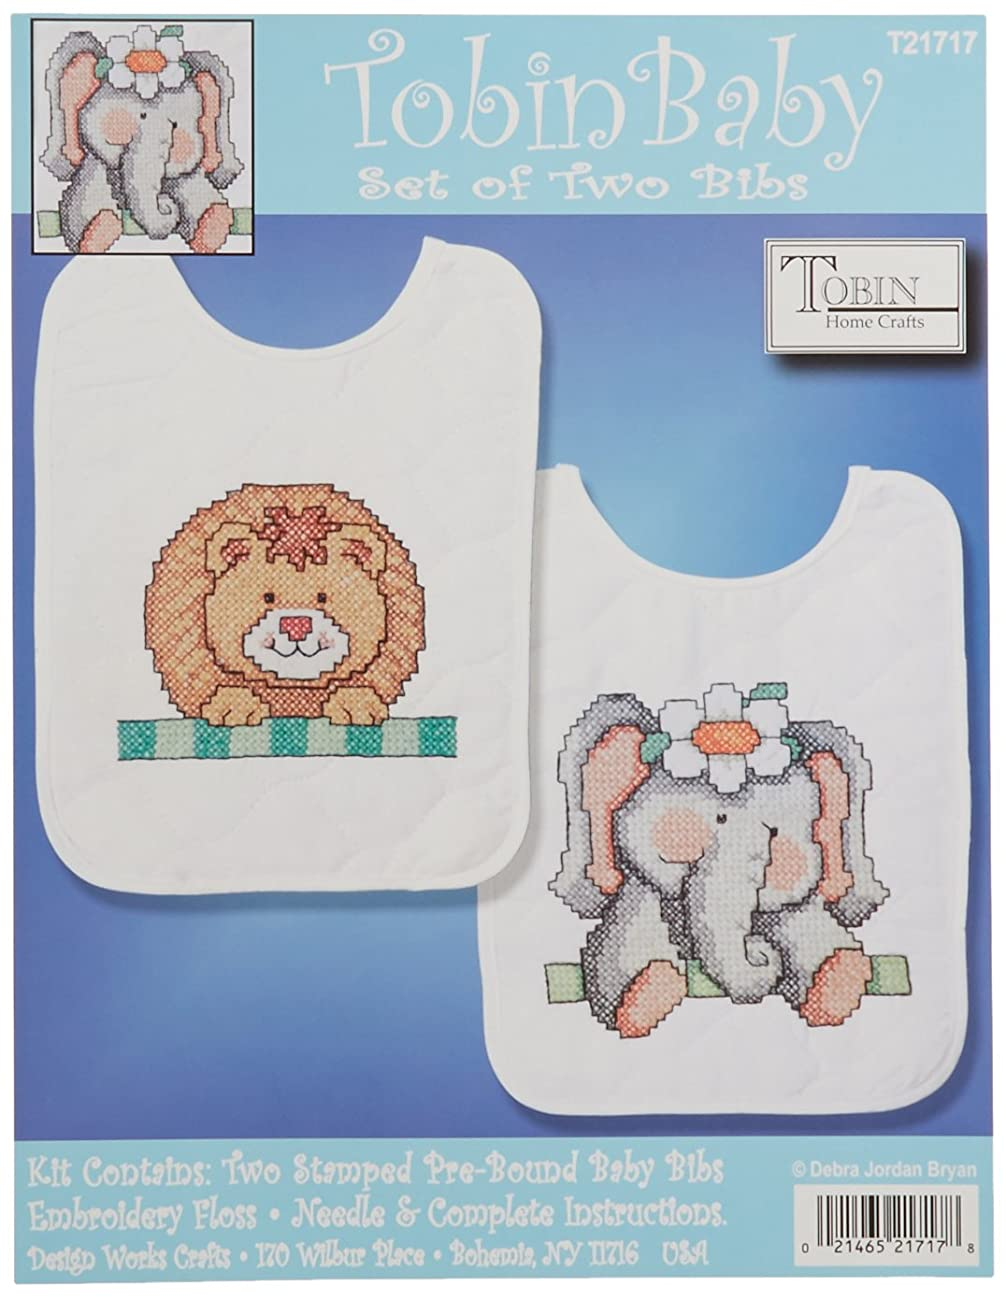 Tobin Noah's Ark Bib Pair Stamped Cross Stitch Kit, 8 by 10-Inch, Set of 2